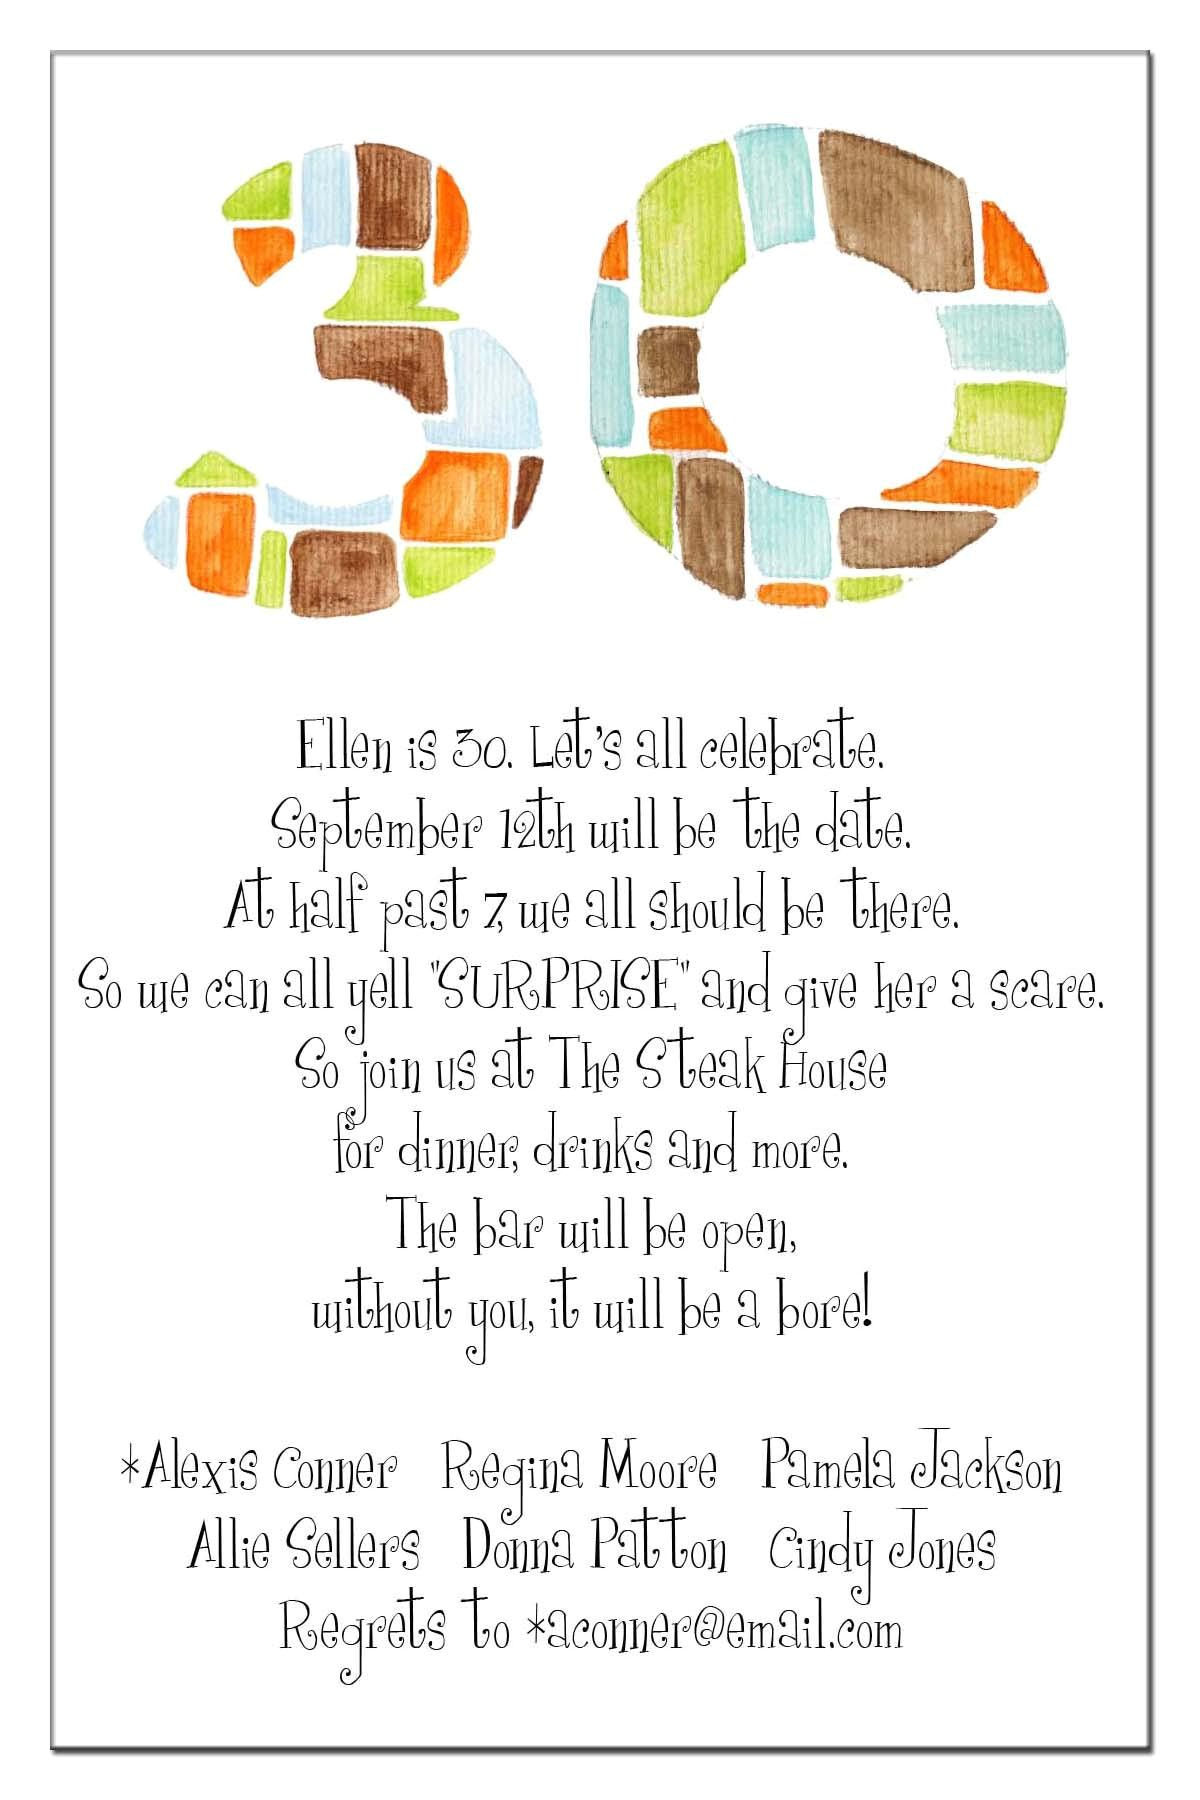 Surprise 30th Birthday Party Invitation Wording 20 Interesting 30th Birthday Invitations themes – Wording